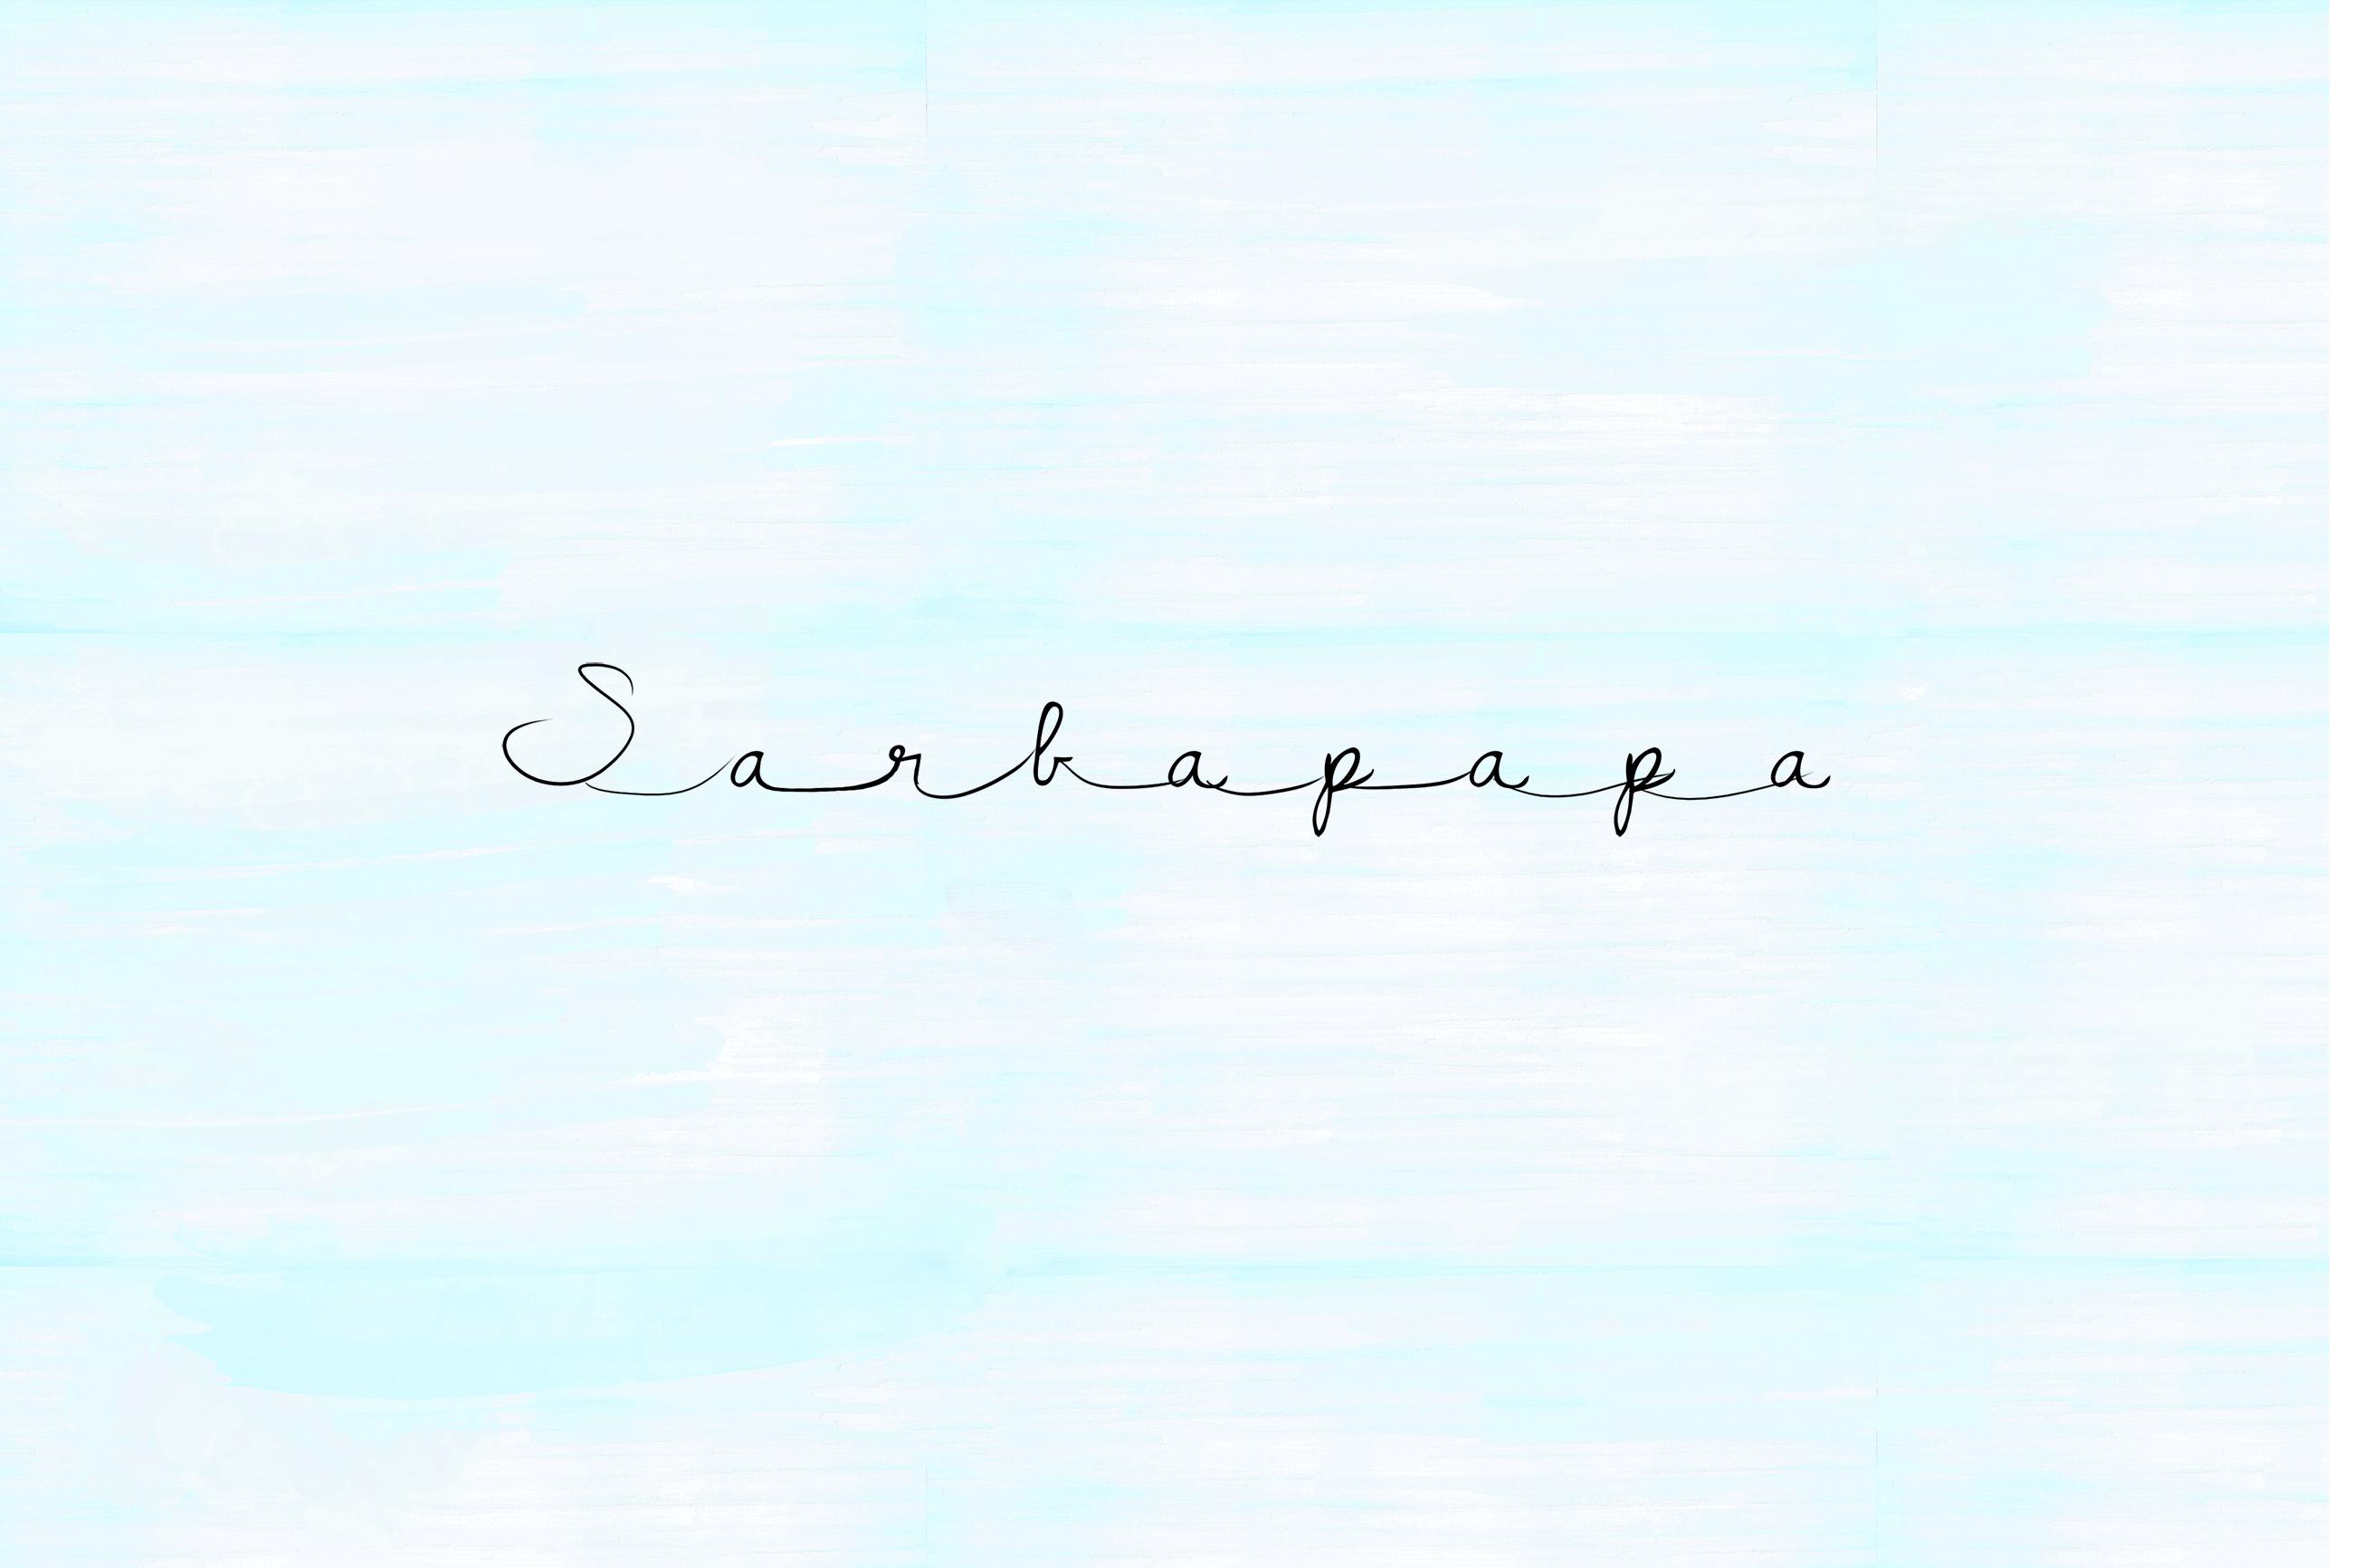 Sarbapapa